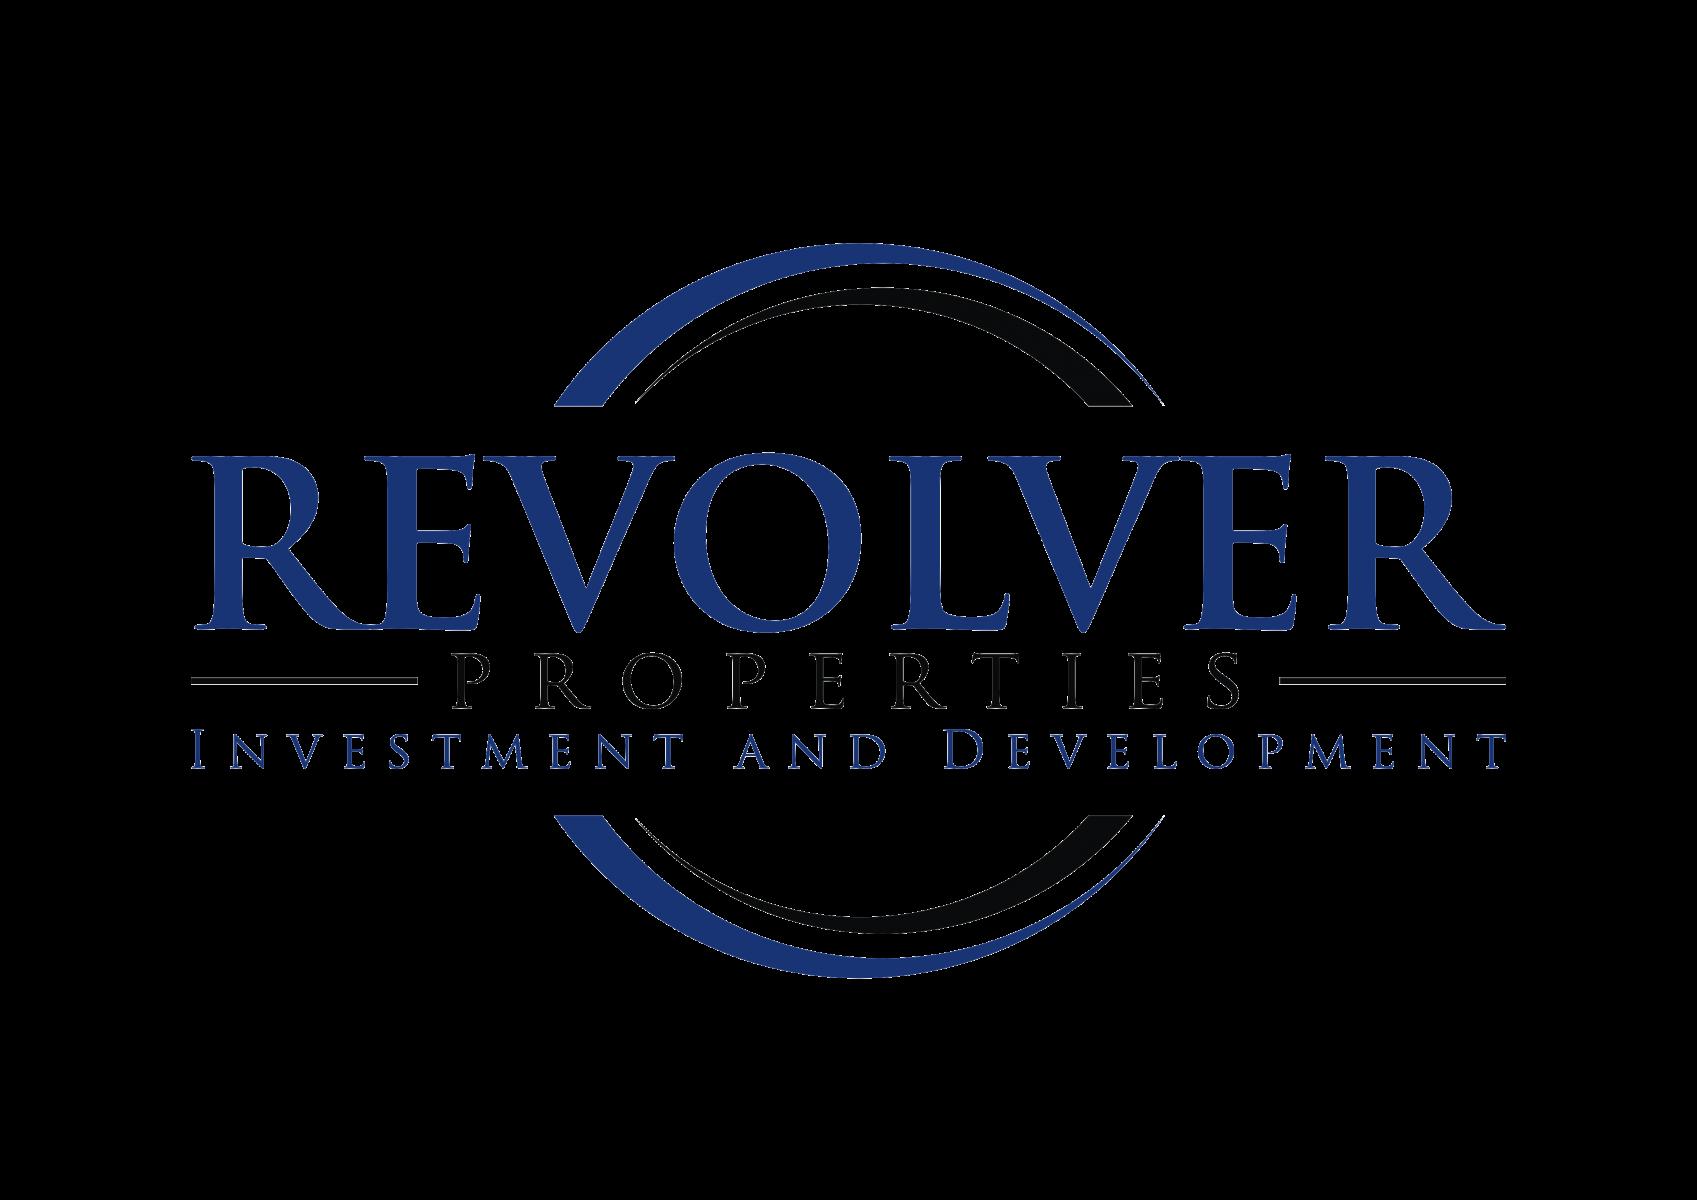 REVOLVER PROPERTIES logo